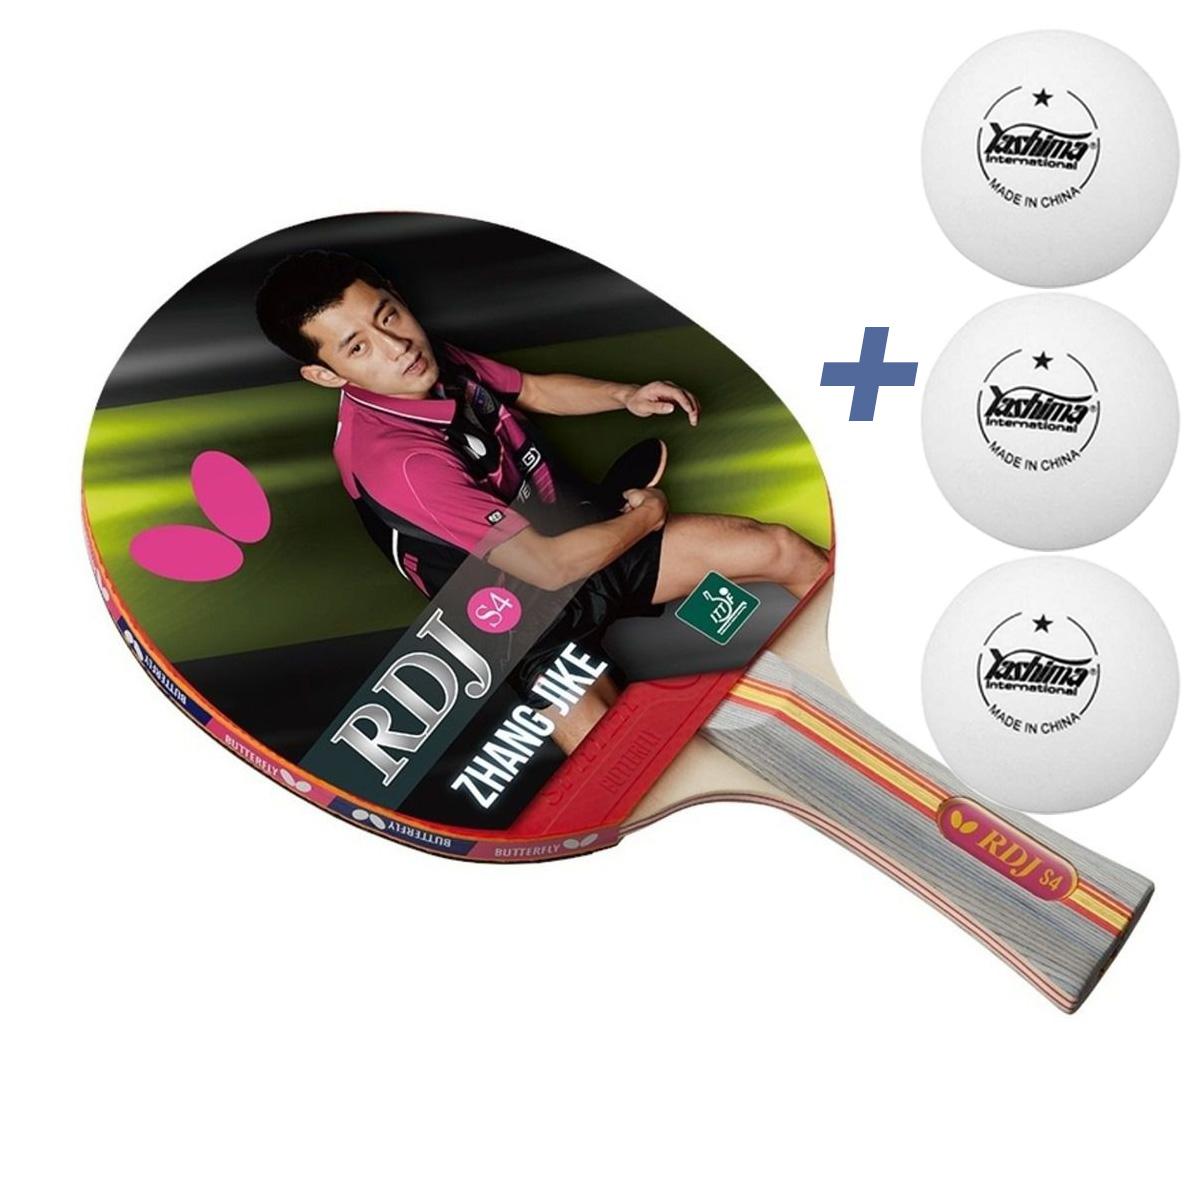 Raquete de tenis de Mesa Butterfly RDJ S4 - Zhang Jike + Brinde 3 Bolinhas  - REAL ESPORTE